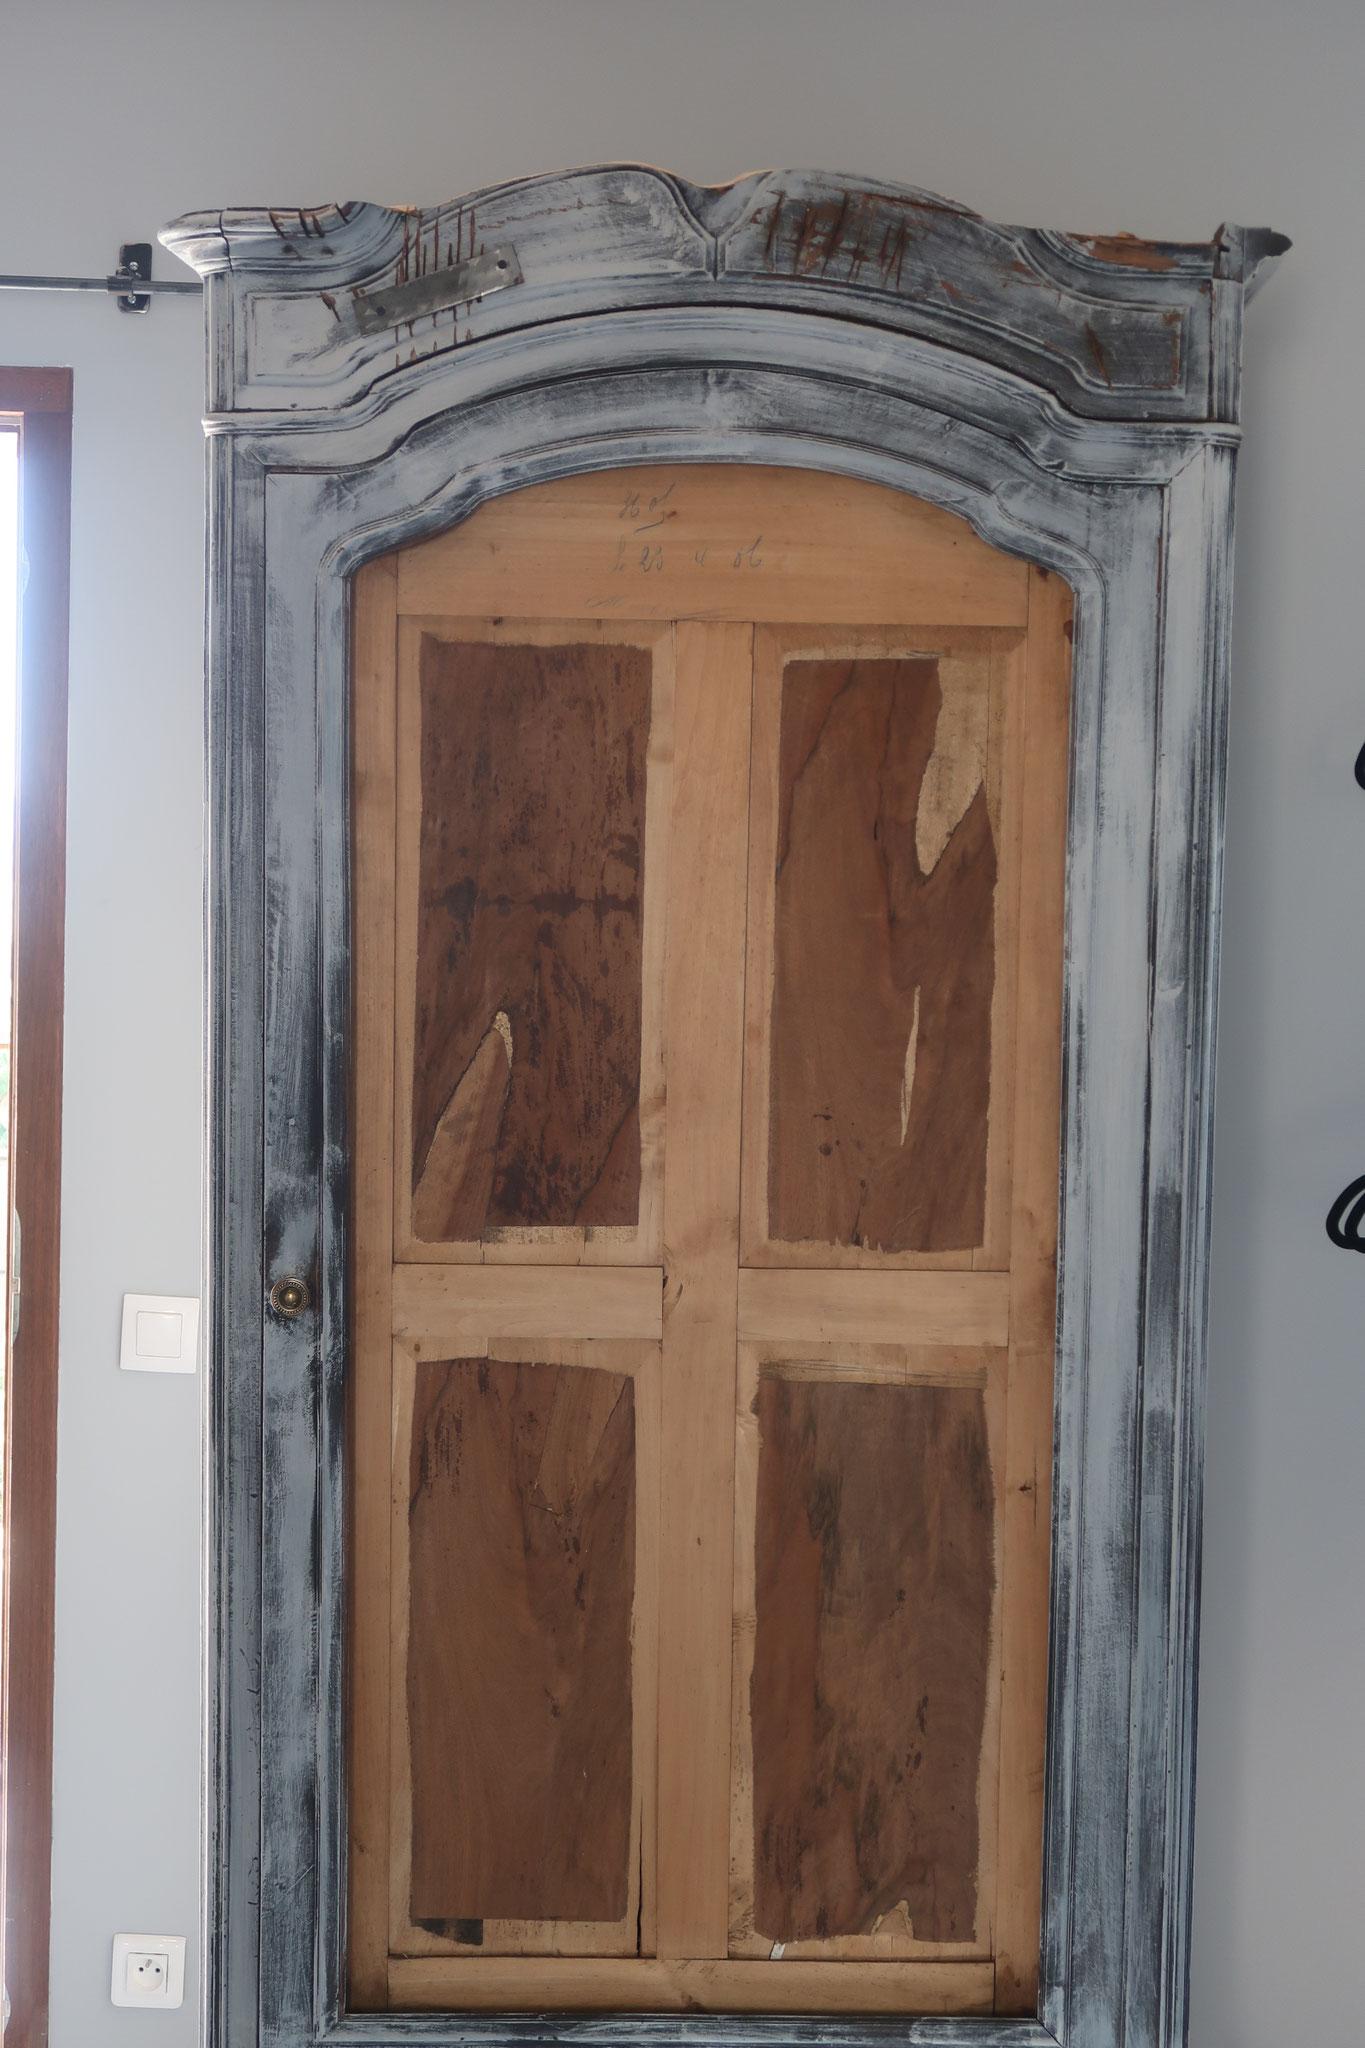 armoire carmen amaya room